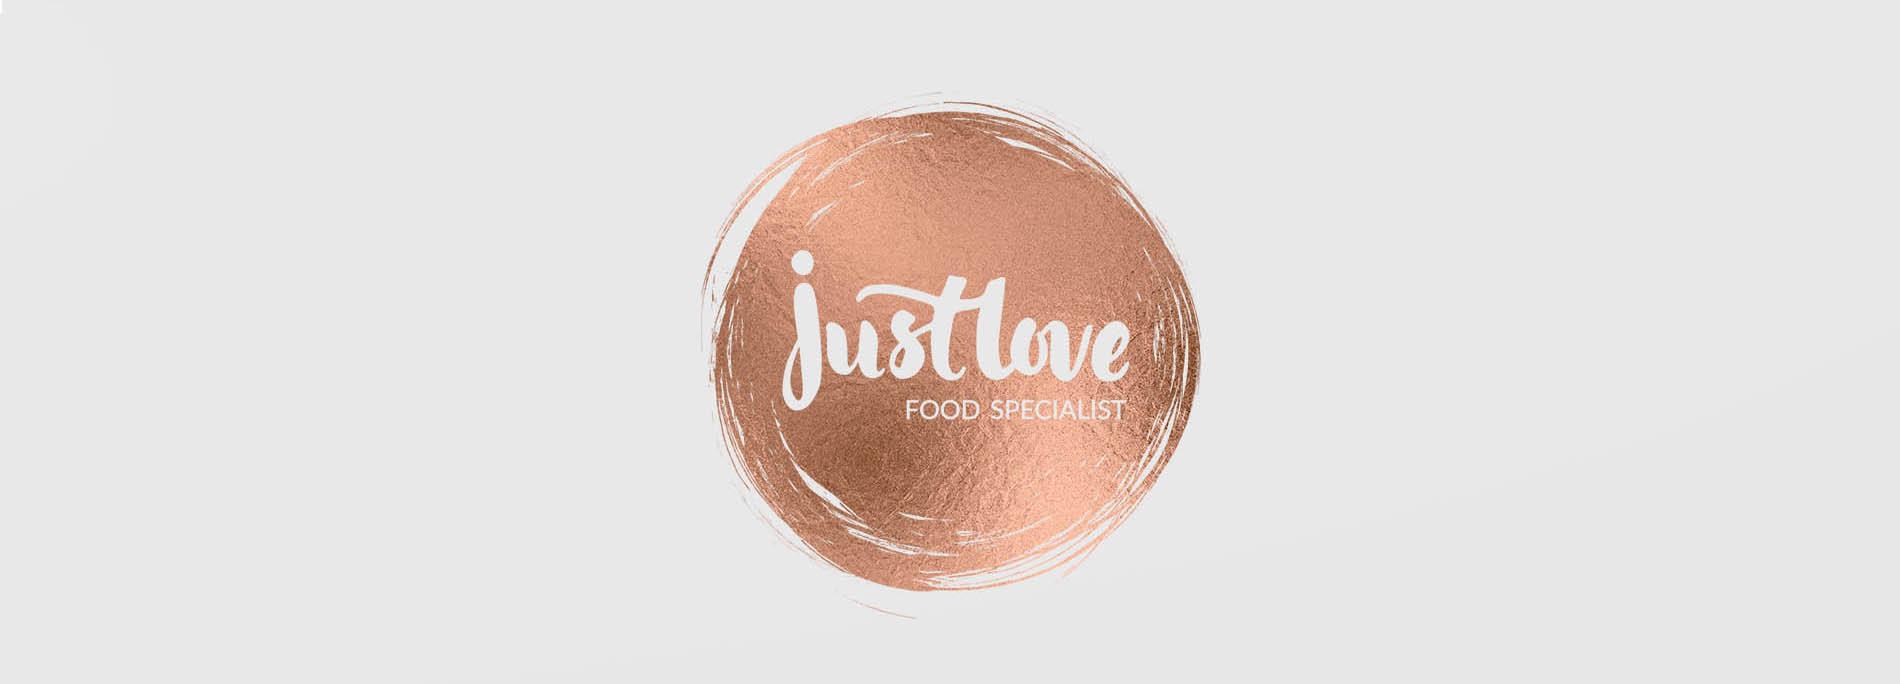 mintlab-brandidentity-justlove-mockup-logo